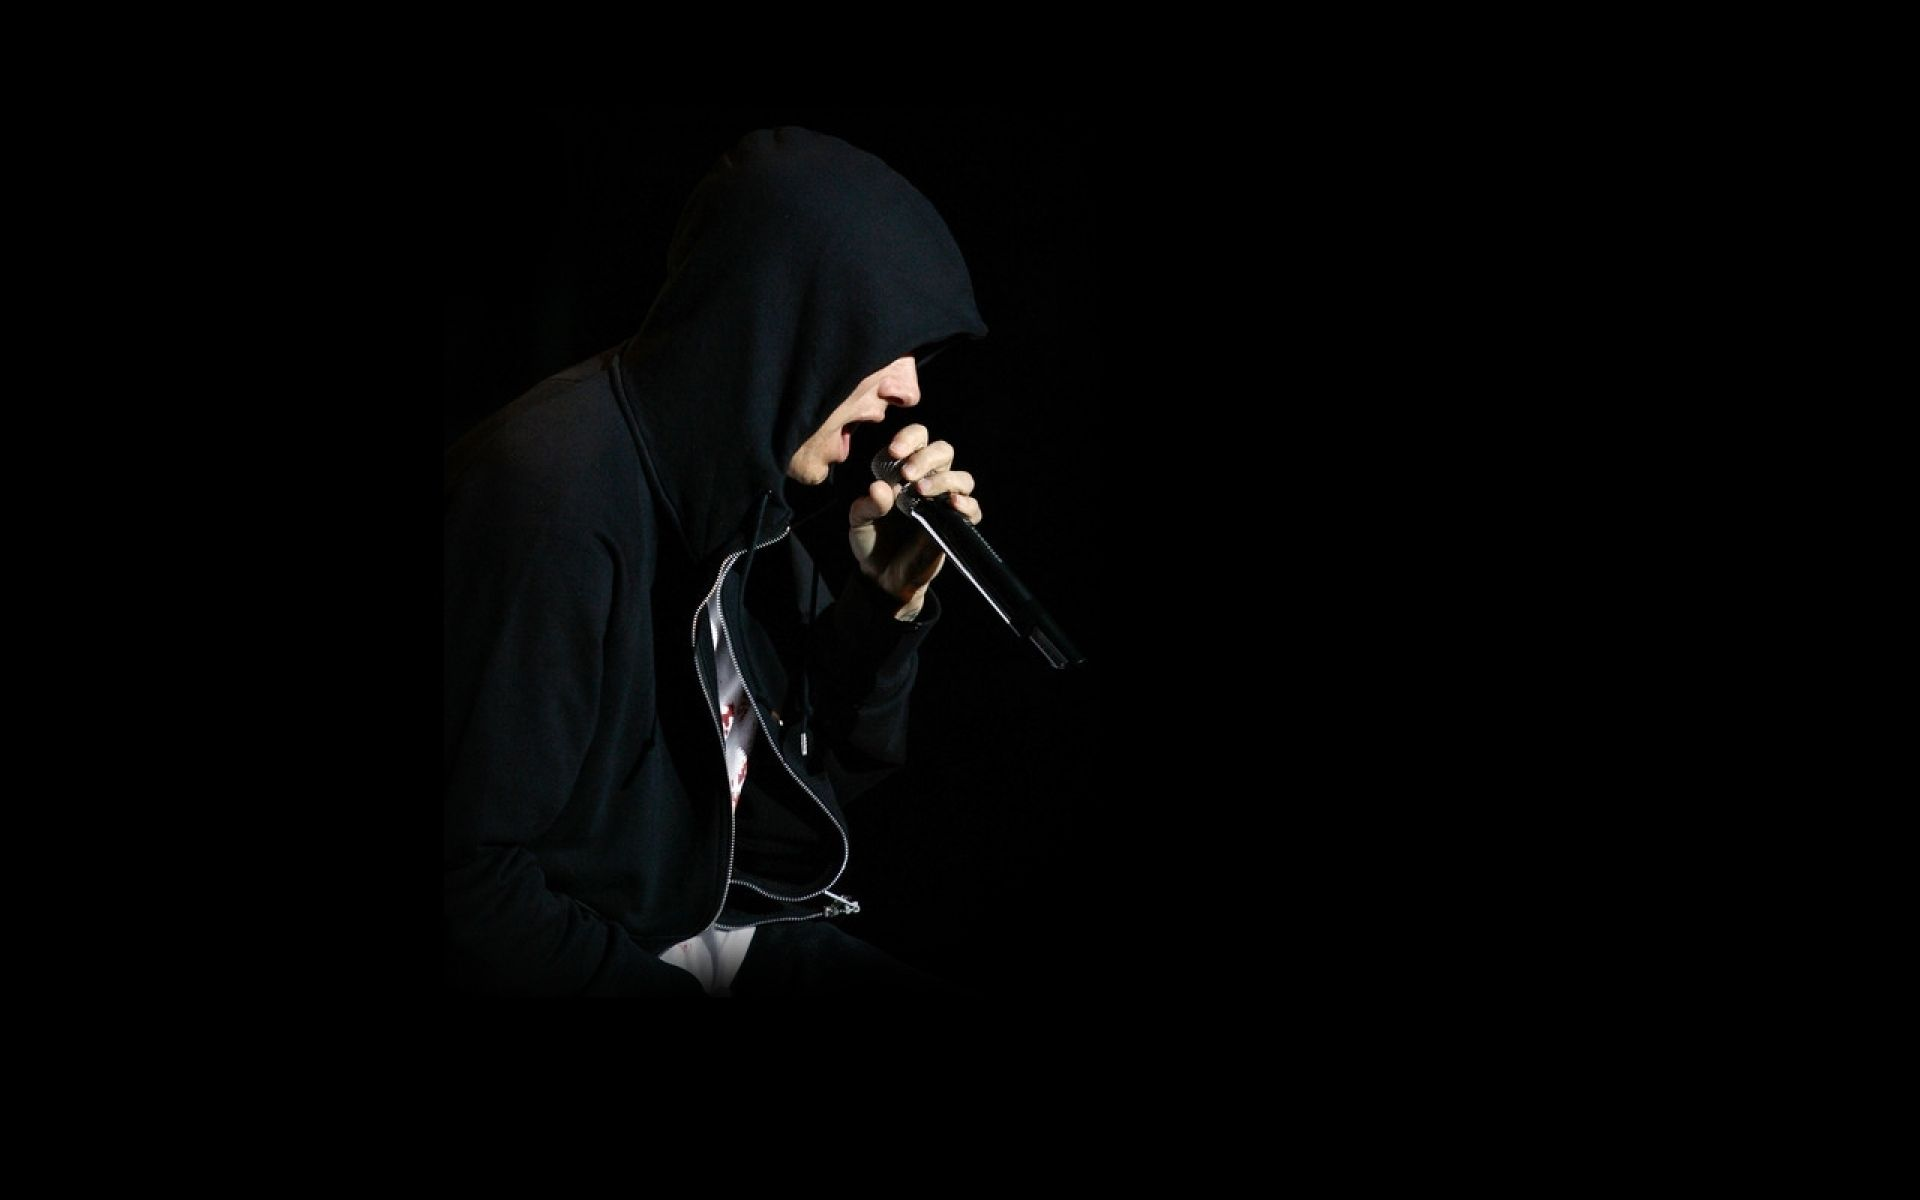 Eminem backgrounds